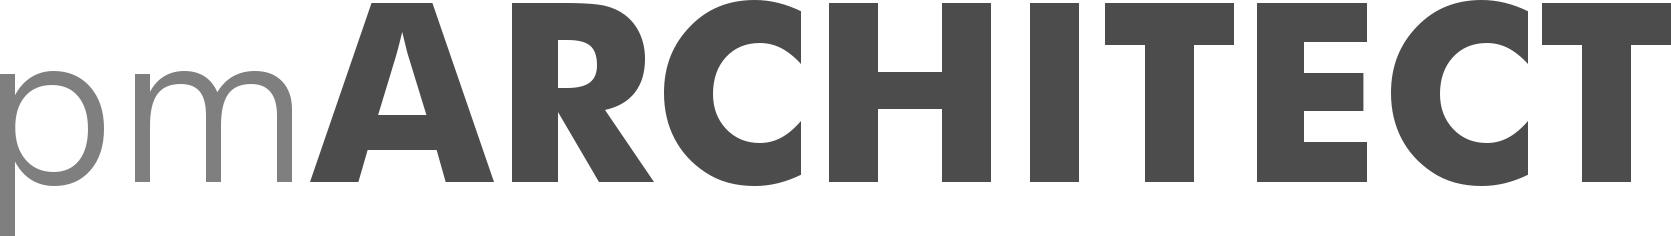 pmARCHITECT